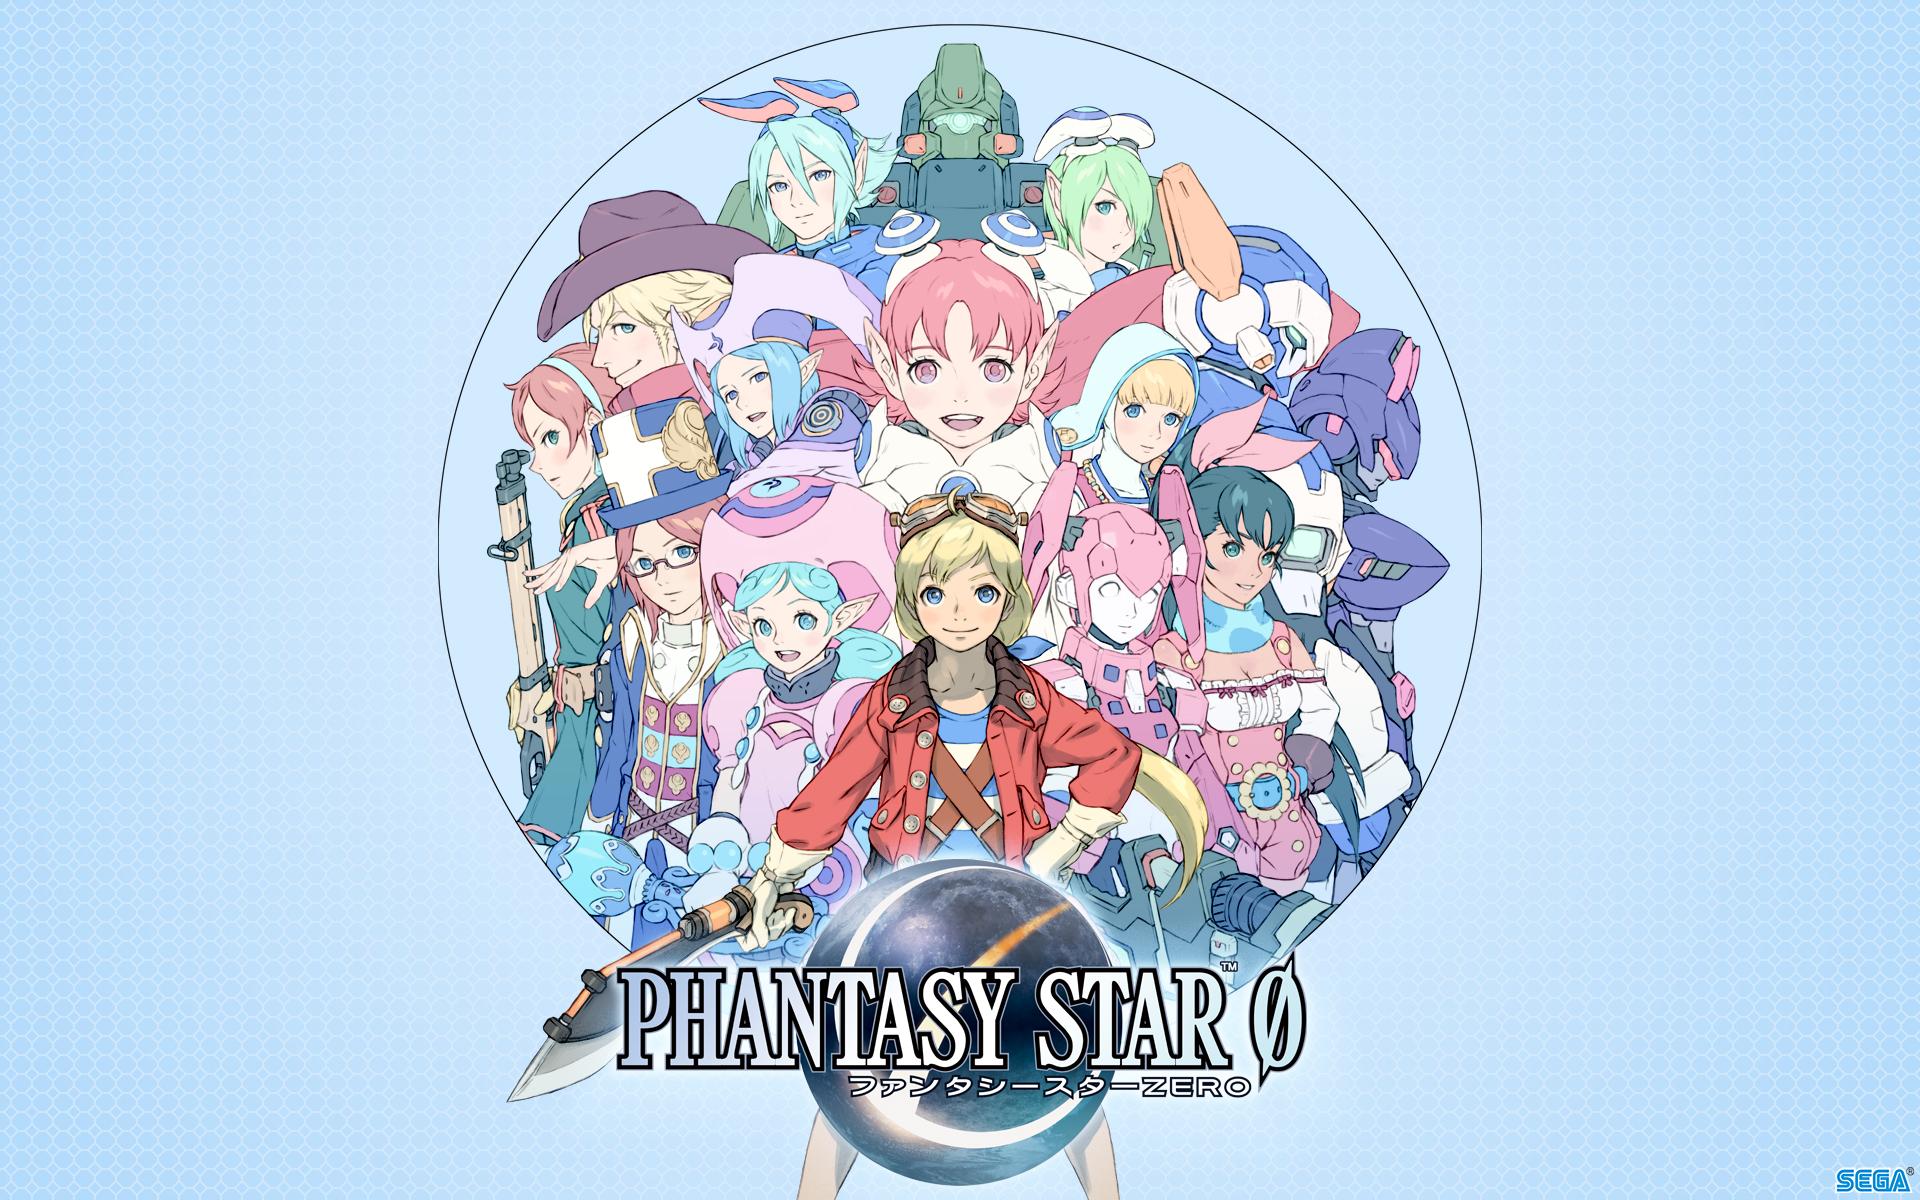 phantasy star zero | rpg site